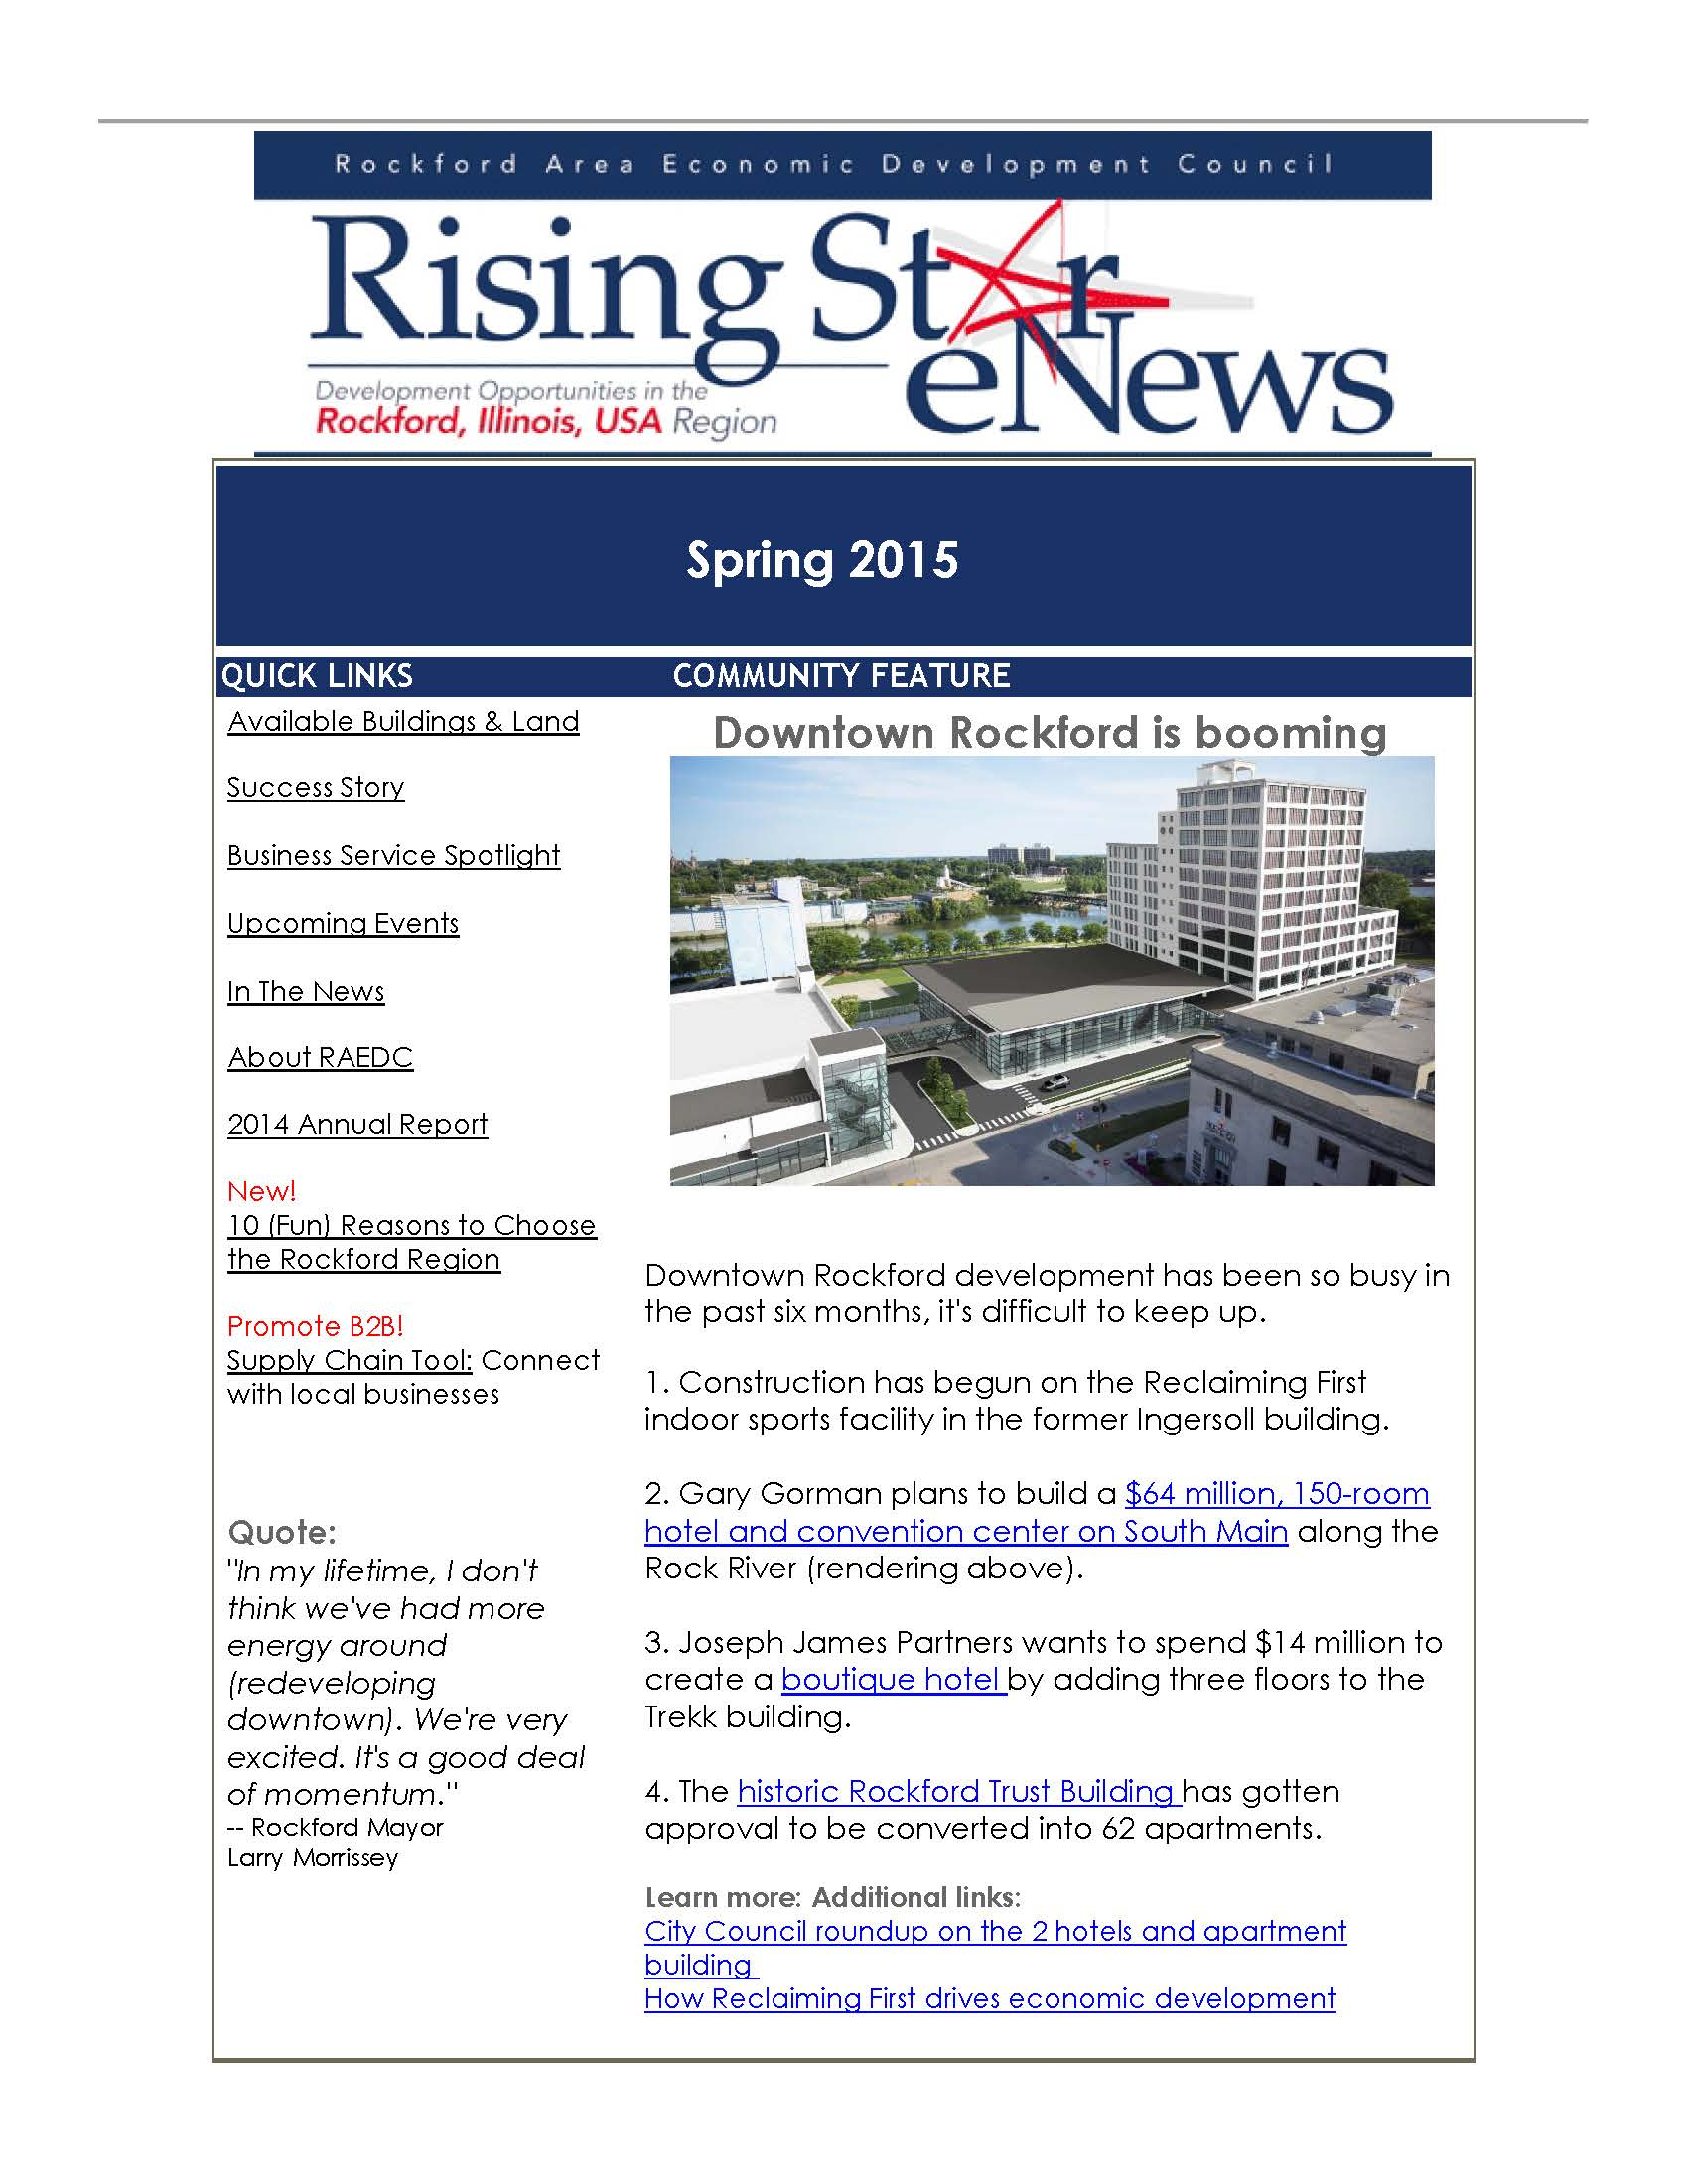 Rising Star Spring 2015 Newsletter focuses on real estate opportunities